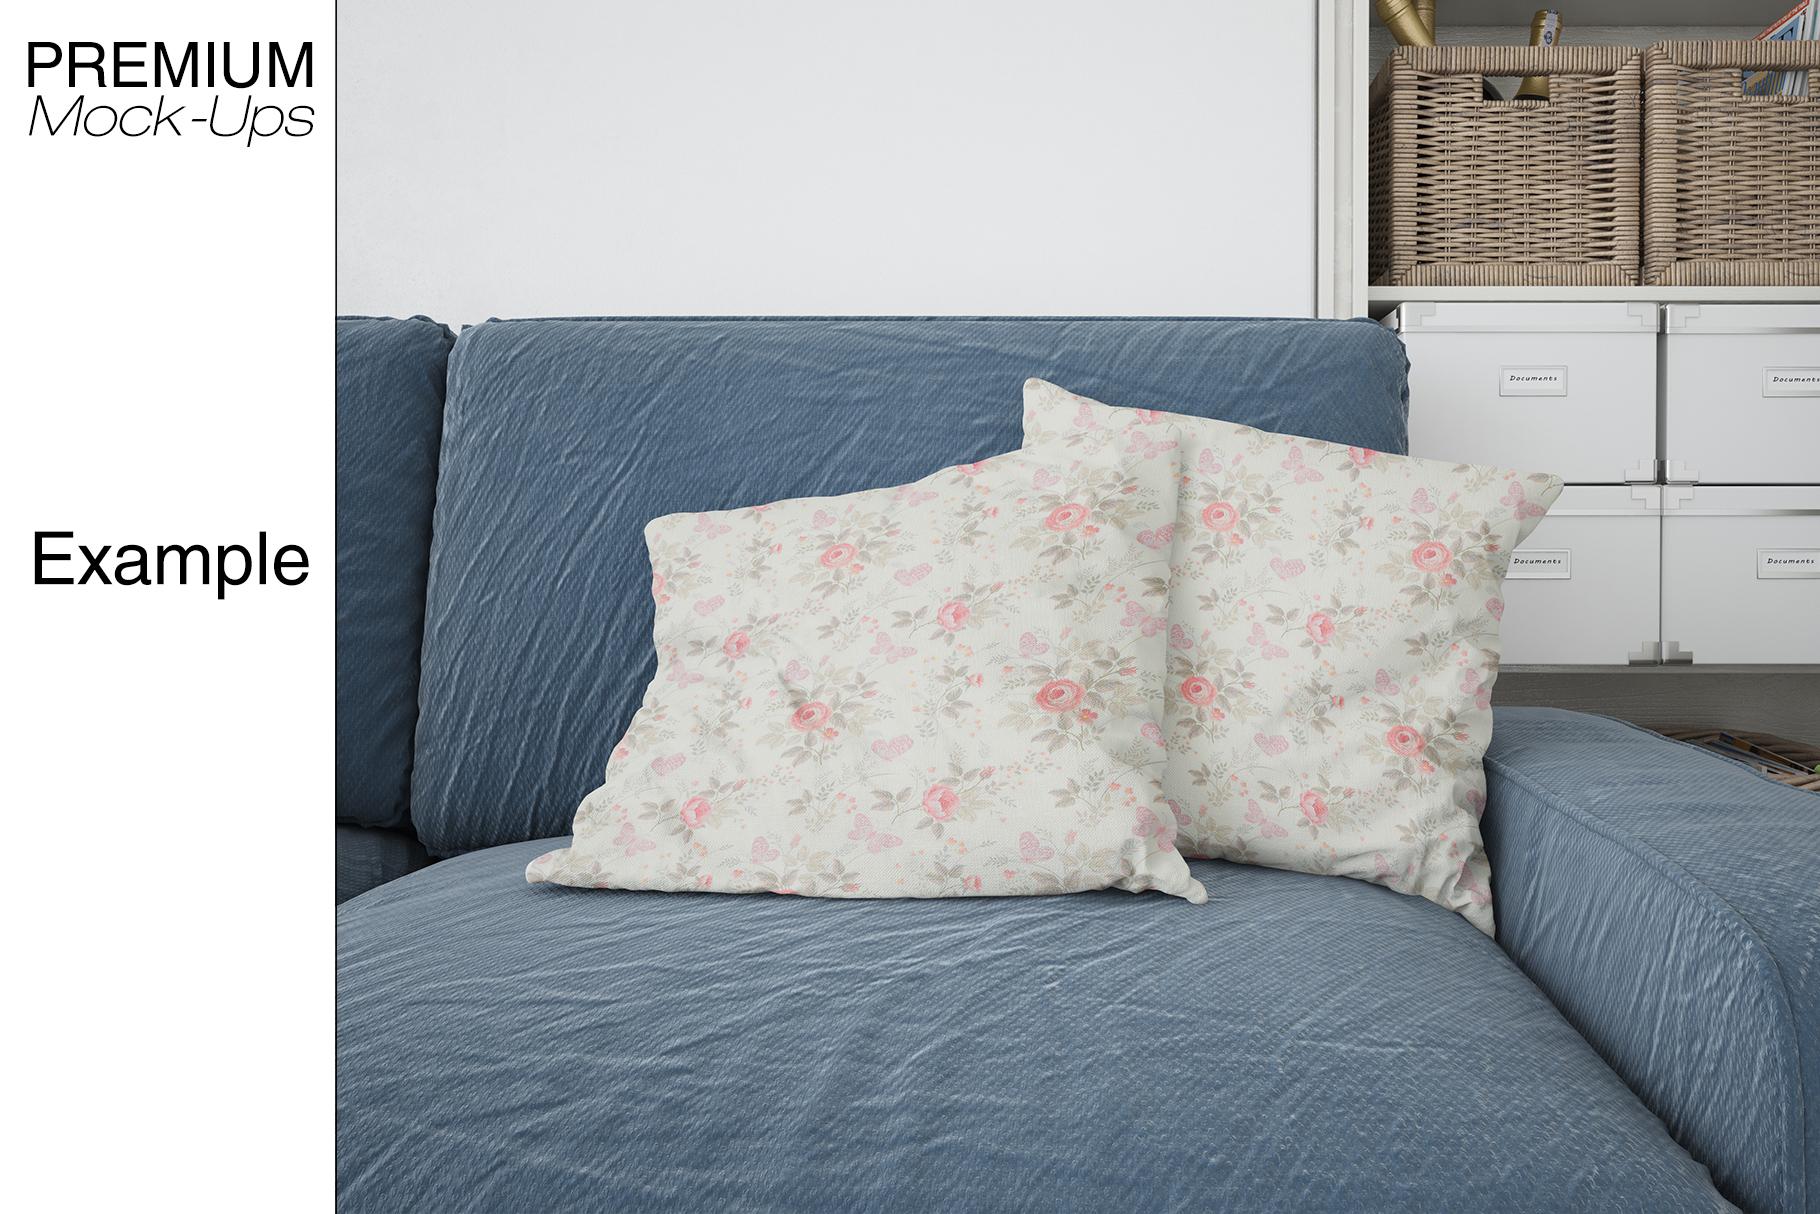 Pillows & Frames Mockup Set example image 11